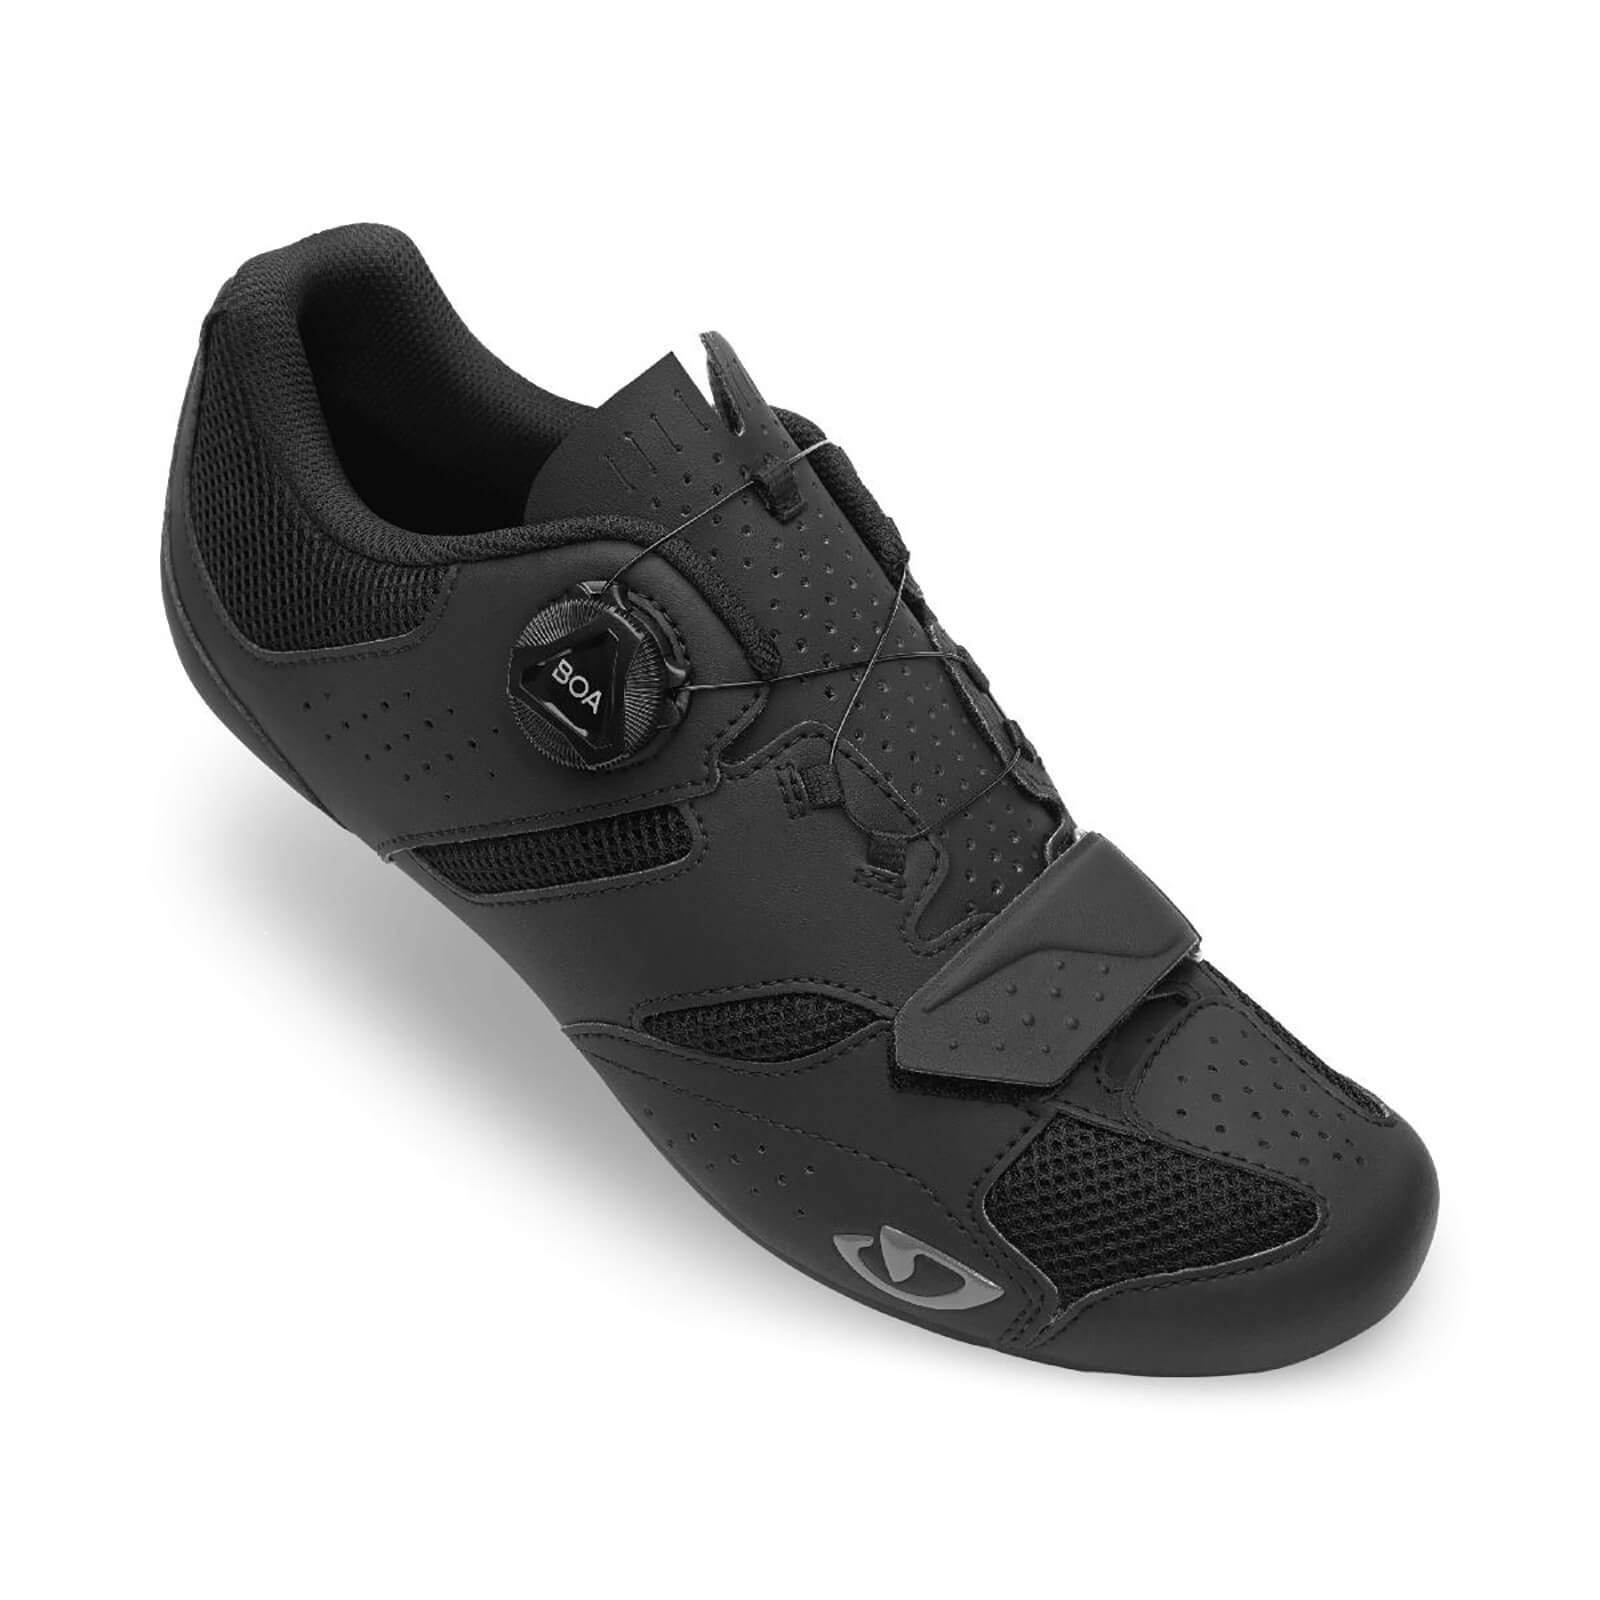 Hjc Valeco Road Helmet - L - Matt Gloss Black